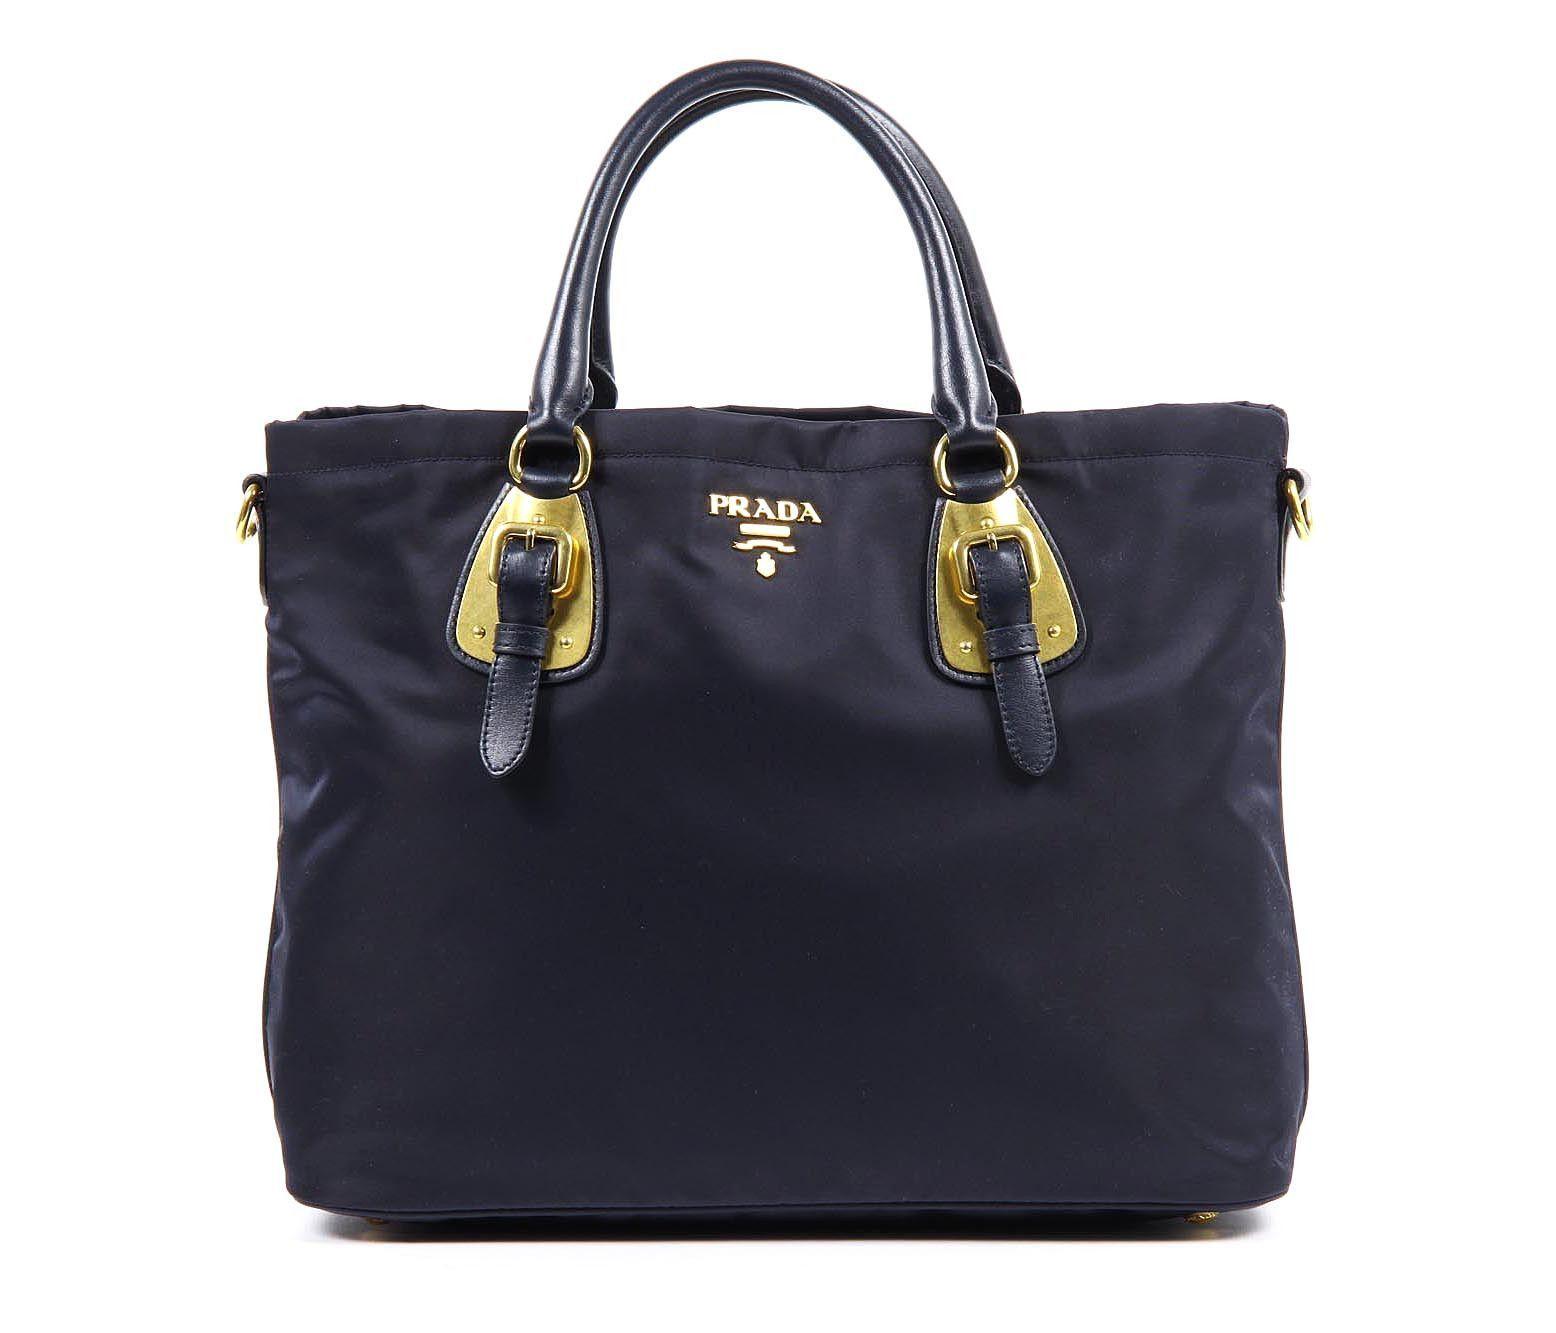 ... bag black 87898 09f8d discount prada tote handbag bleu tessuto soft calf  details external composition nyoln leather measures width height ... add5854aad001